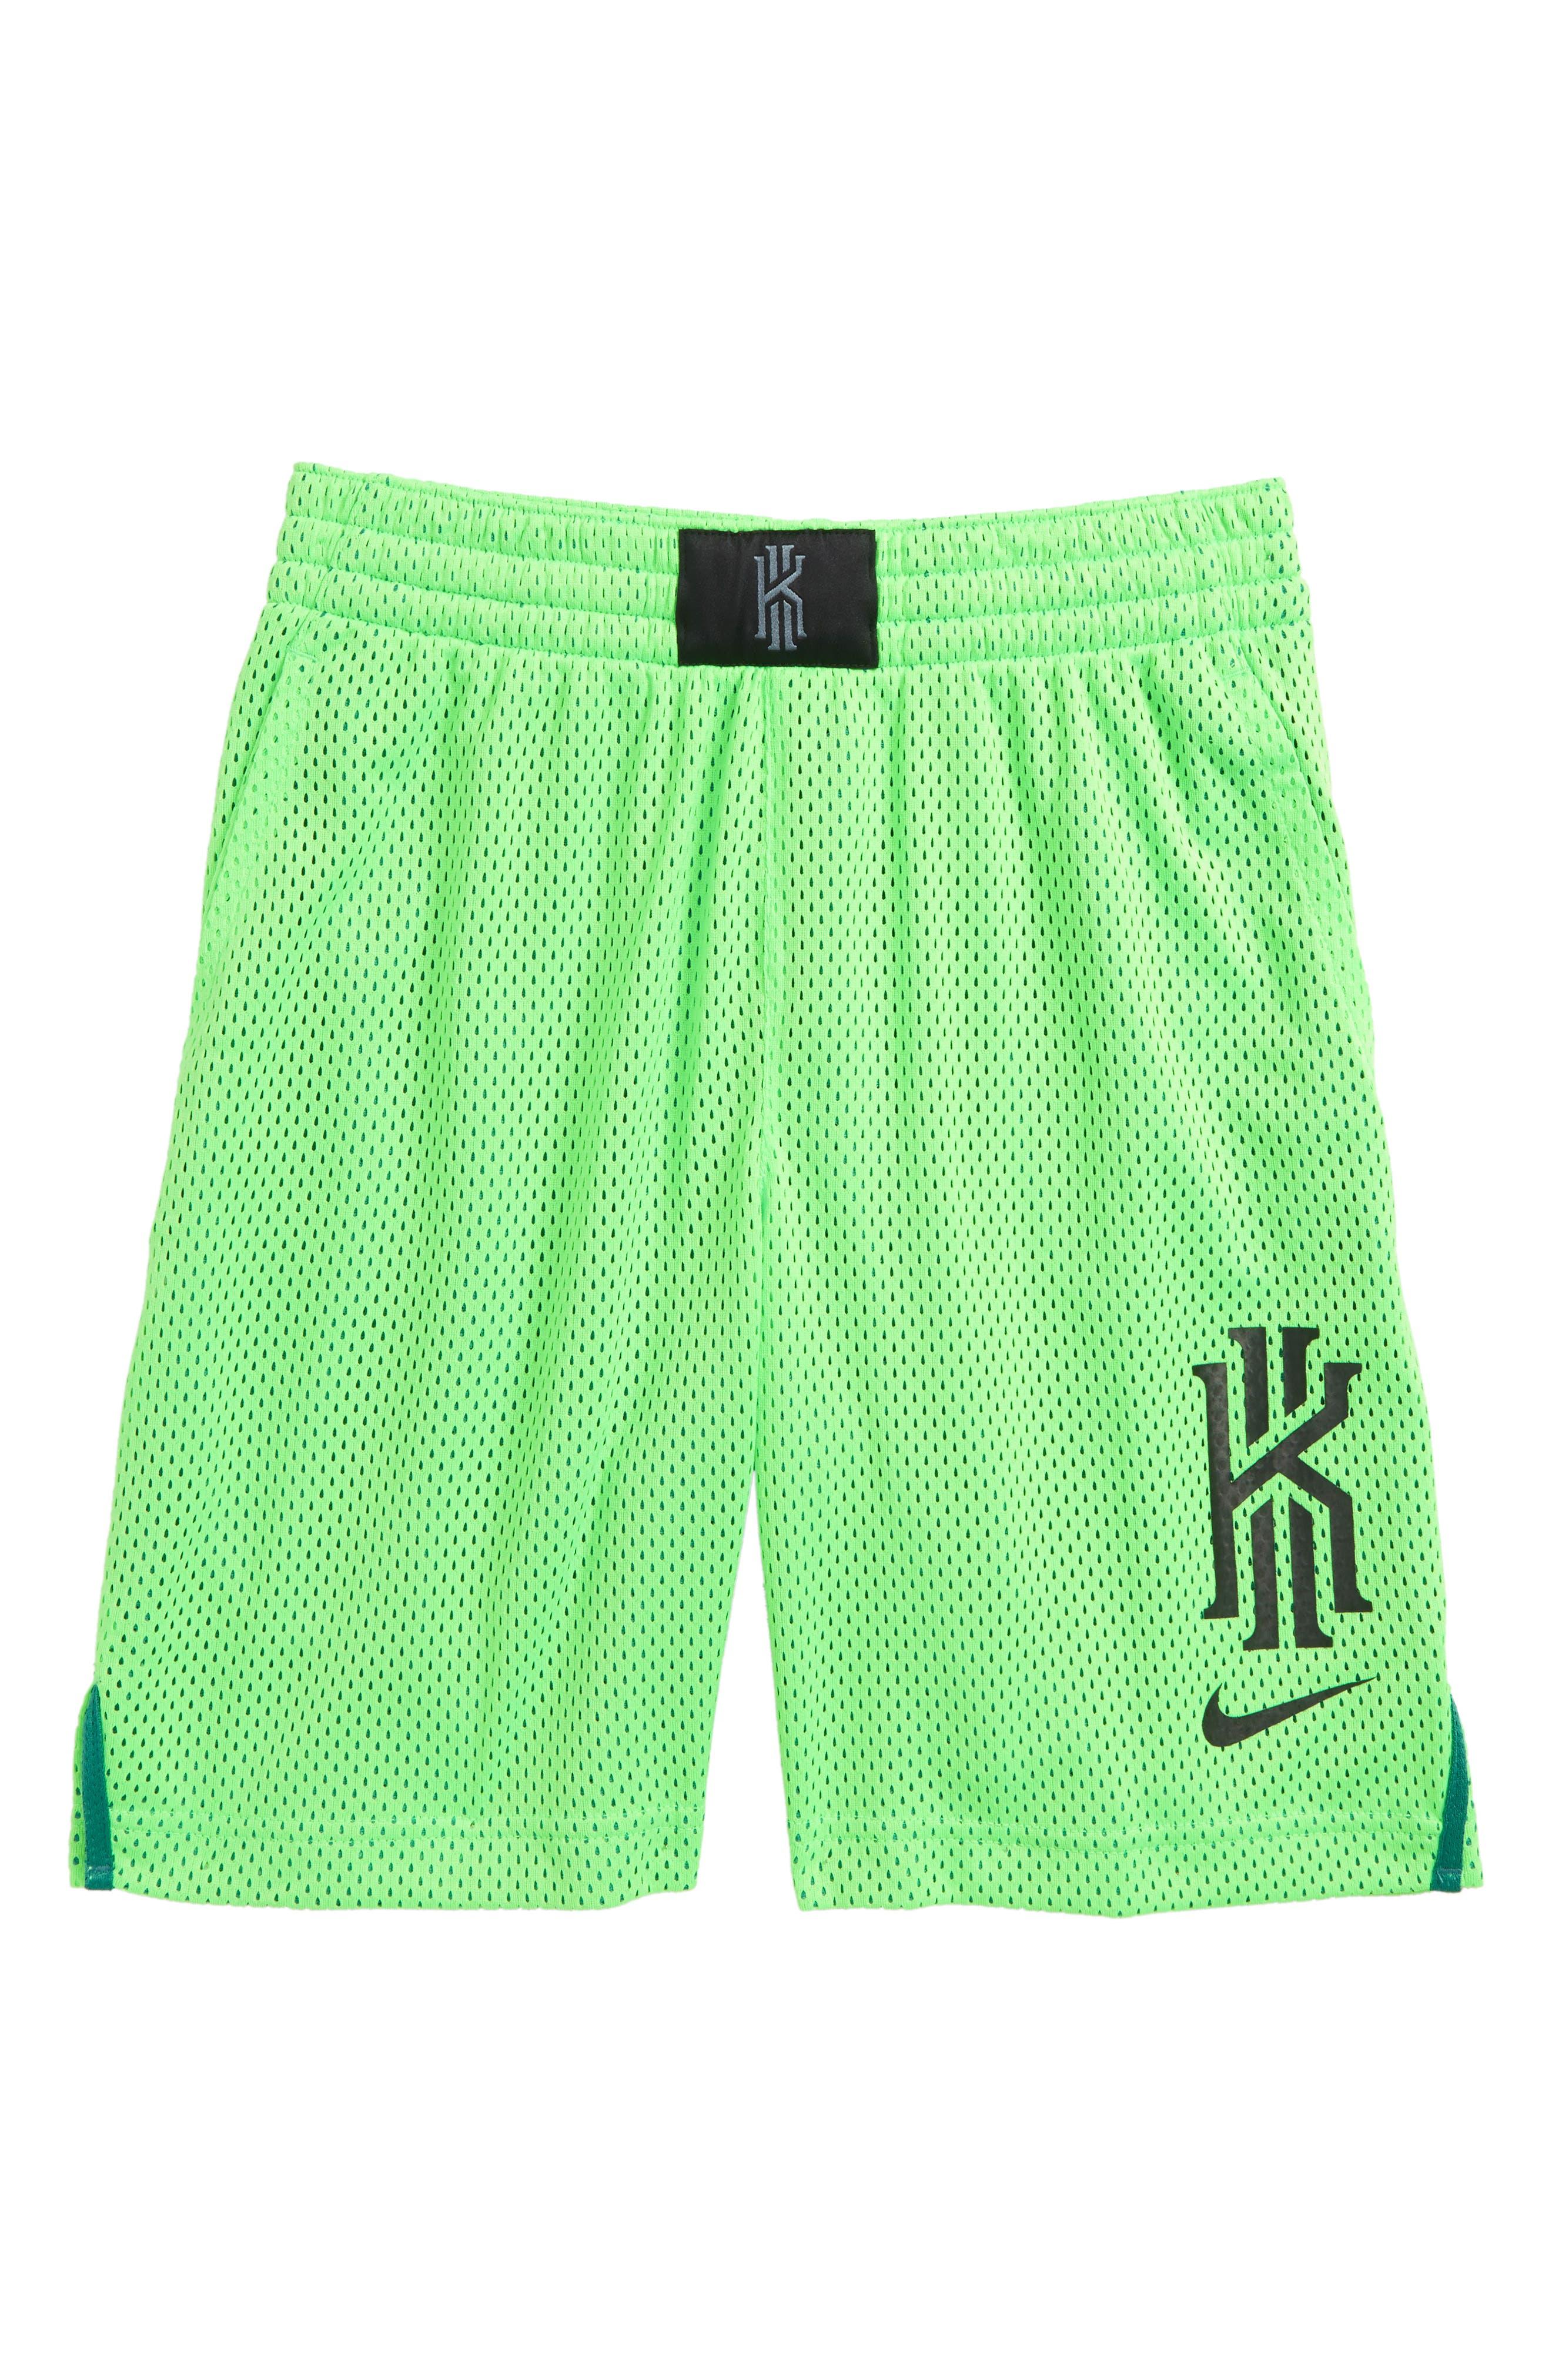 Dry Kyrie Mesh Shorts,                             Main thumbnail 1, color,                             Green Strike/ Black